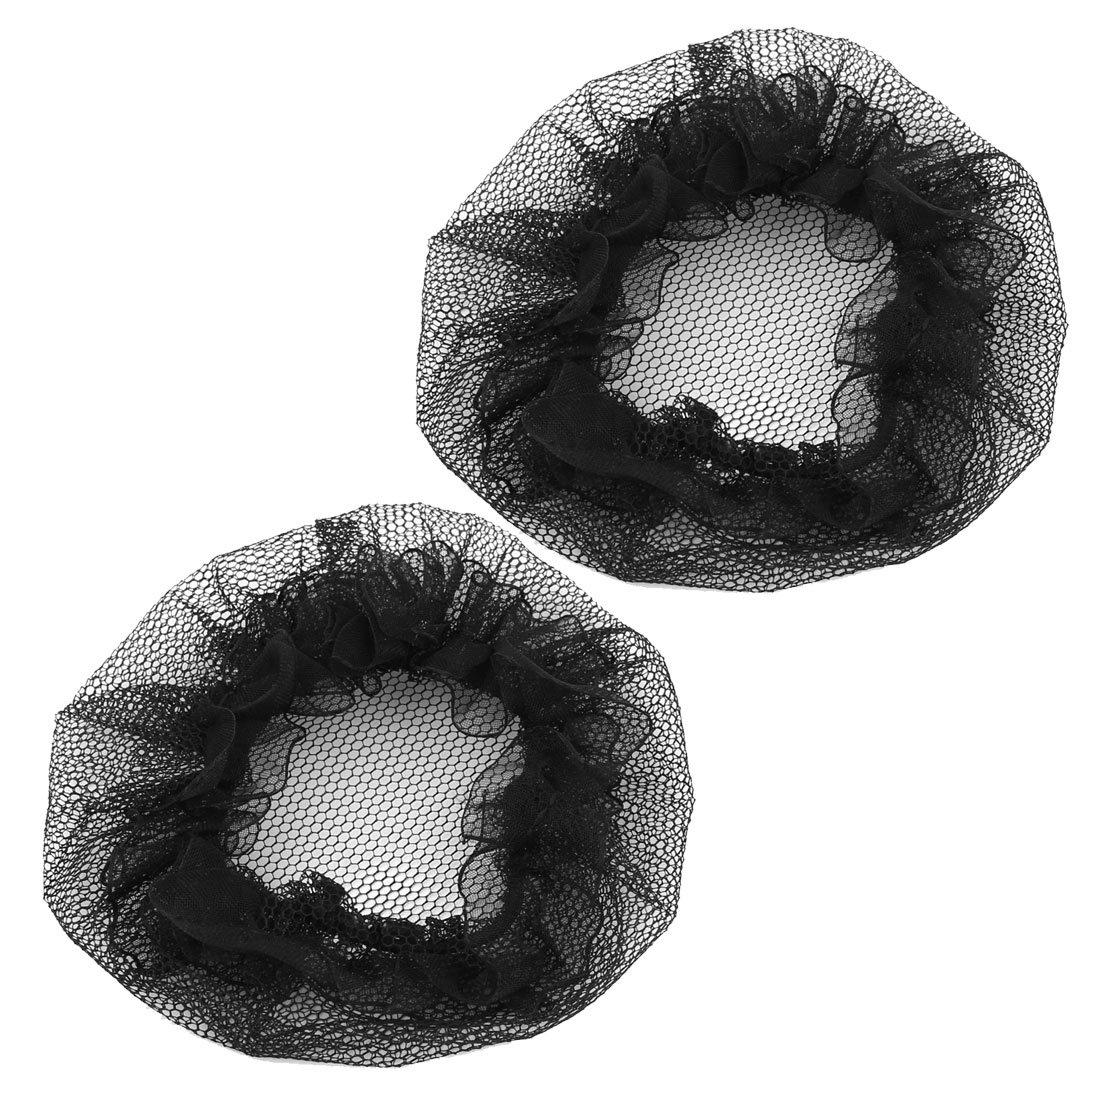 uxcell® 2 Pcs Nylon Mesh Stretchy Ballet Bun Hair Covers Hairnet Black for Woman